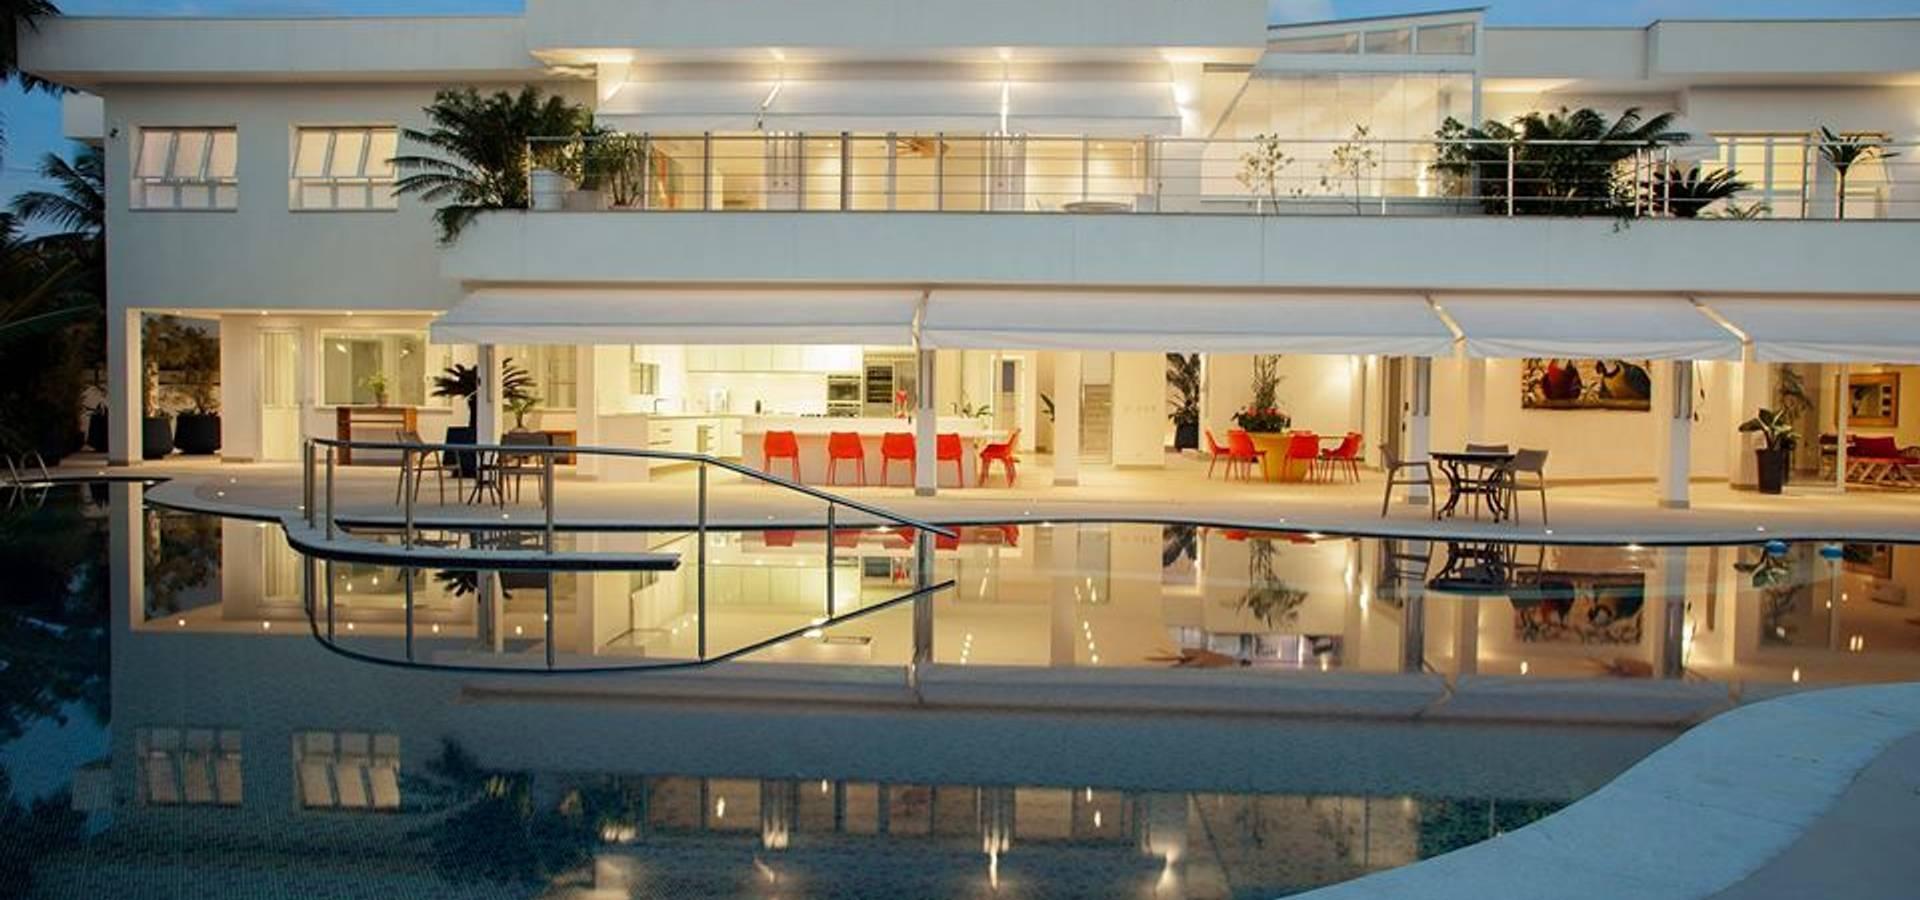 Hurban Liv Arquitetura & Interiores